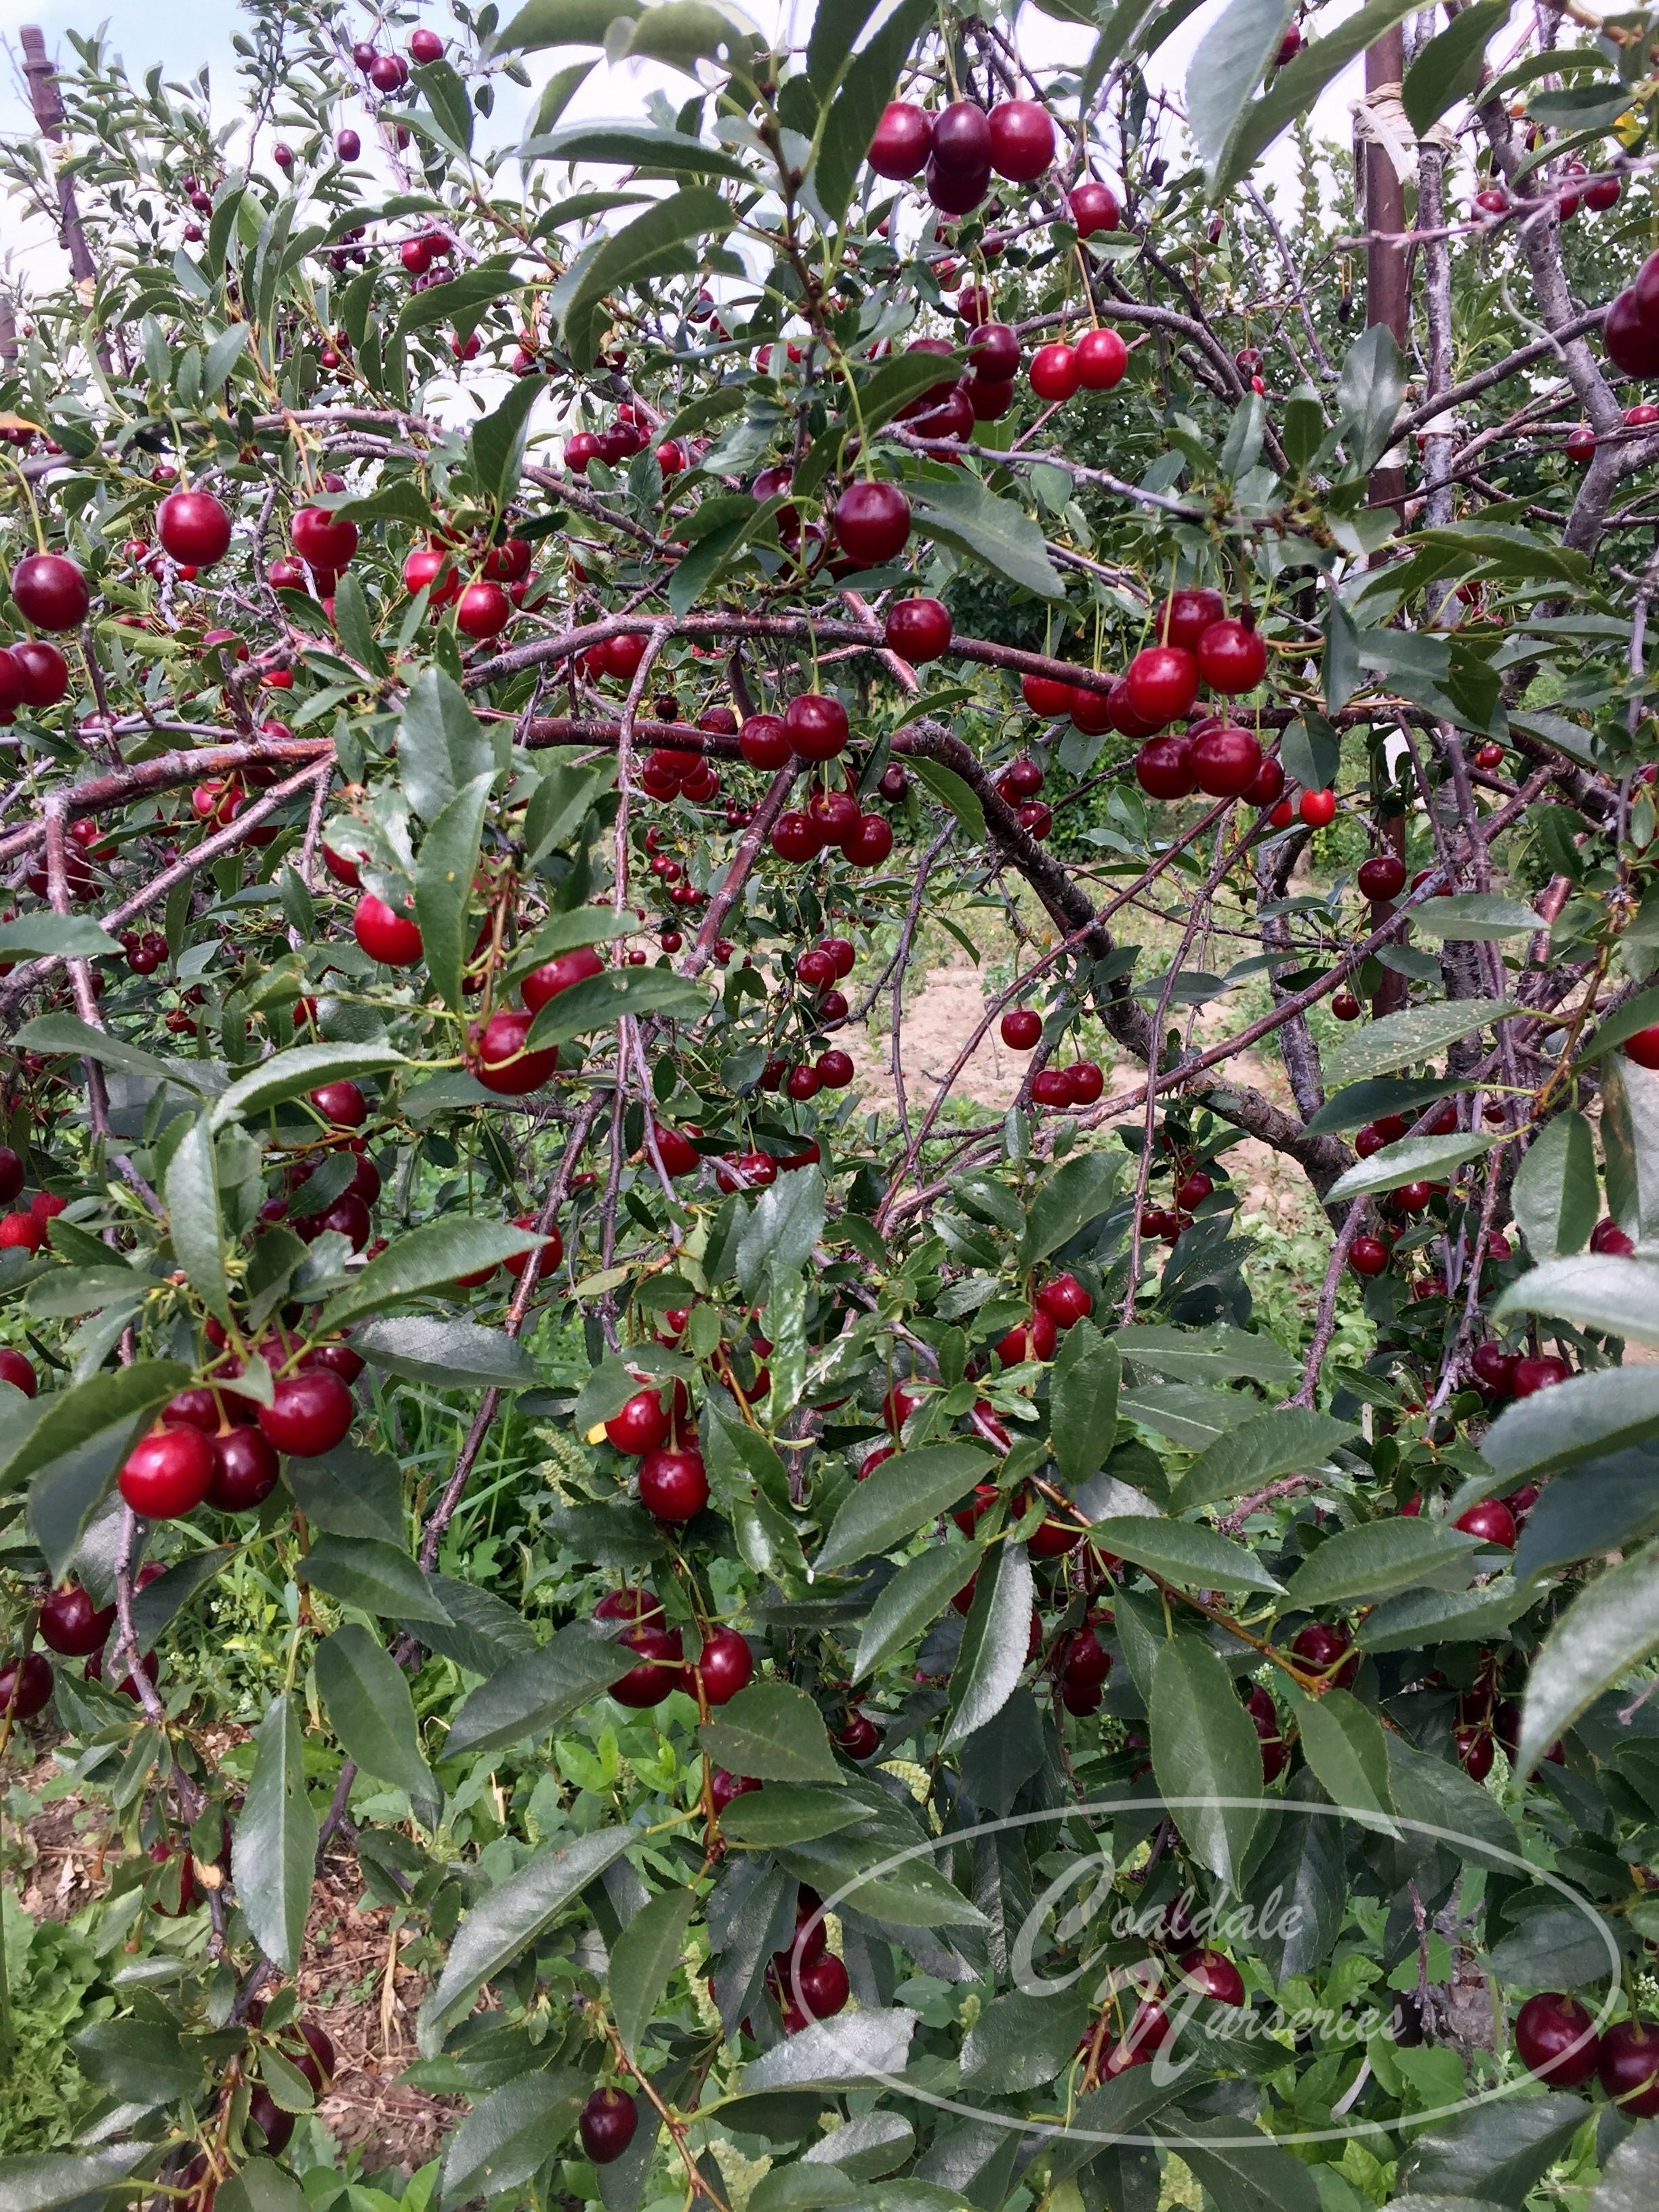 Carmine Jewel Cherry Image